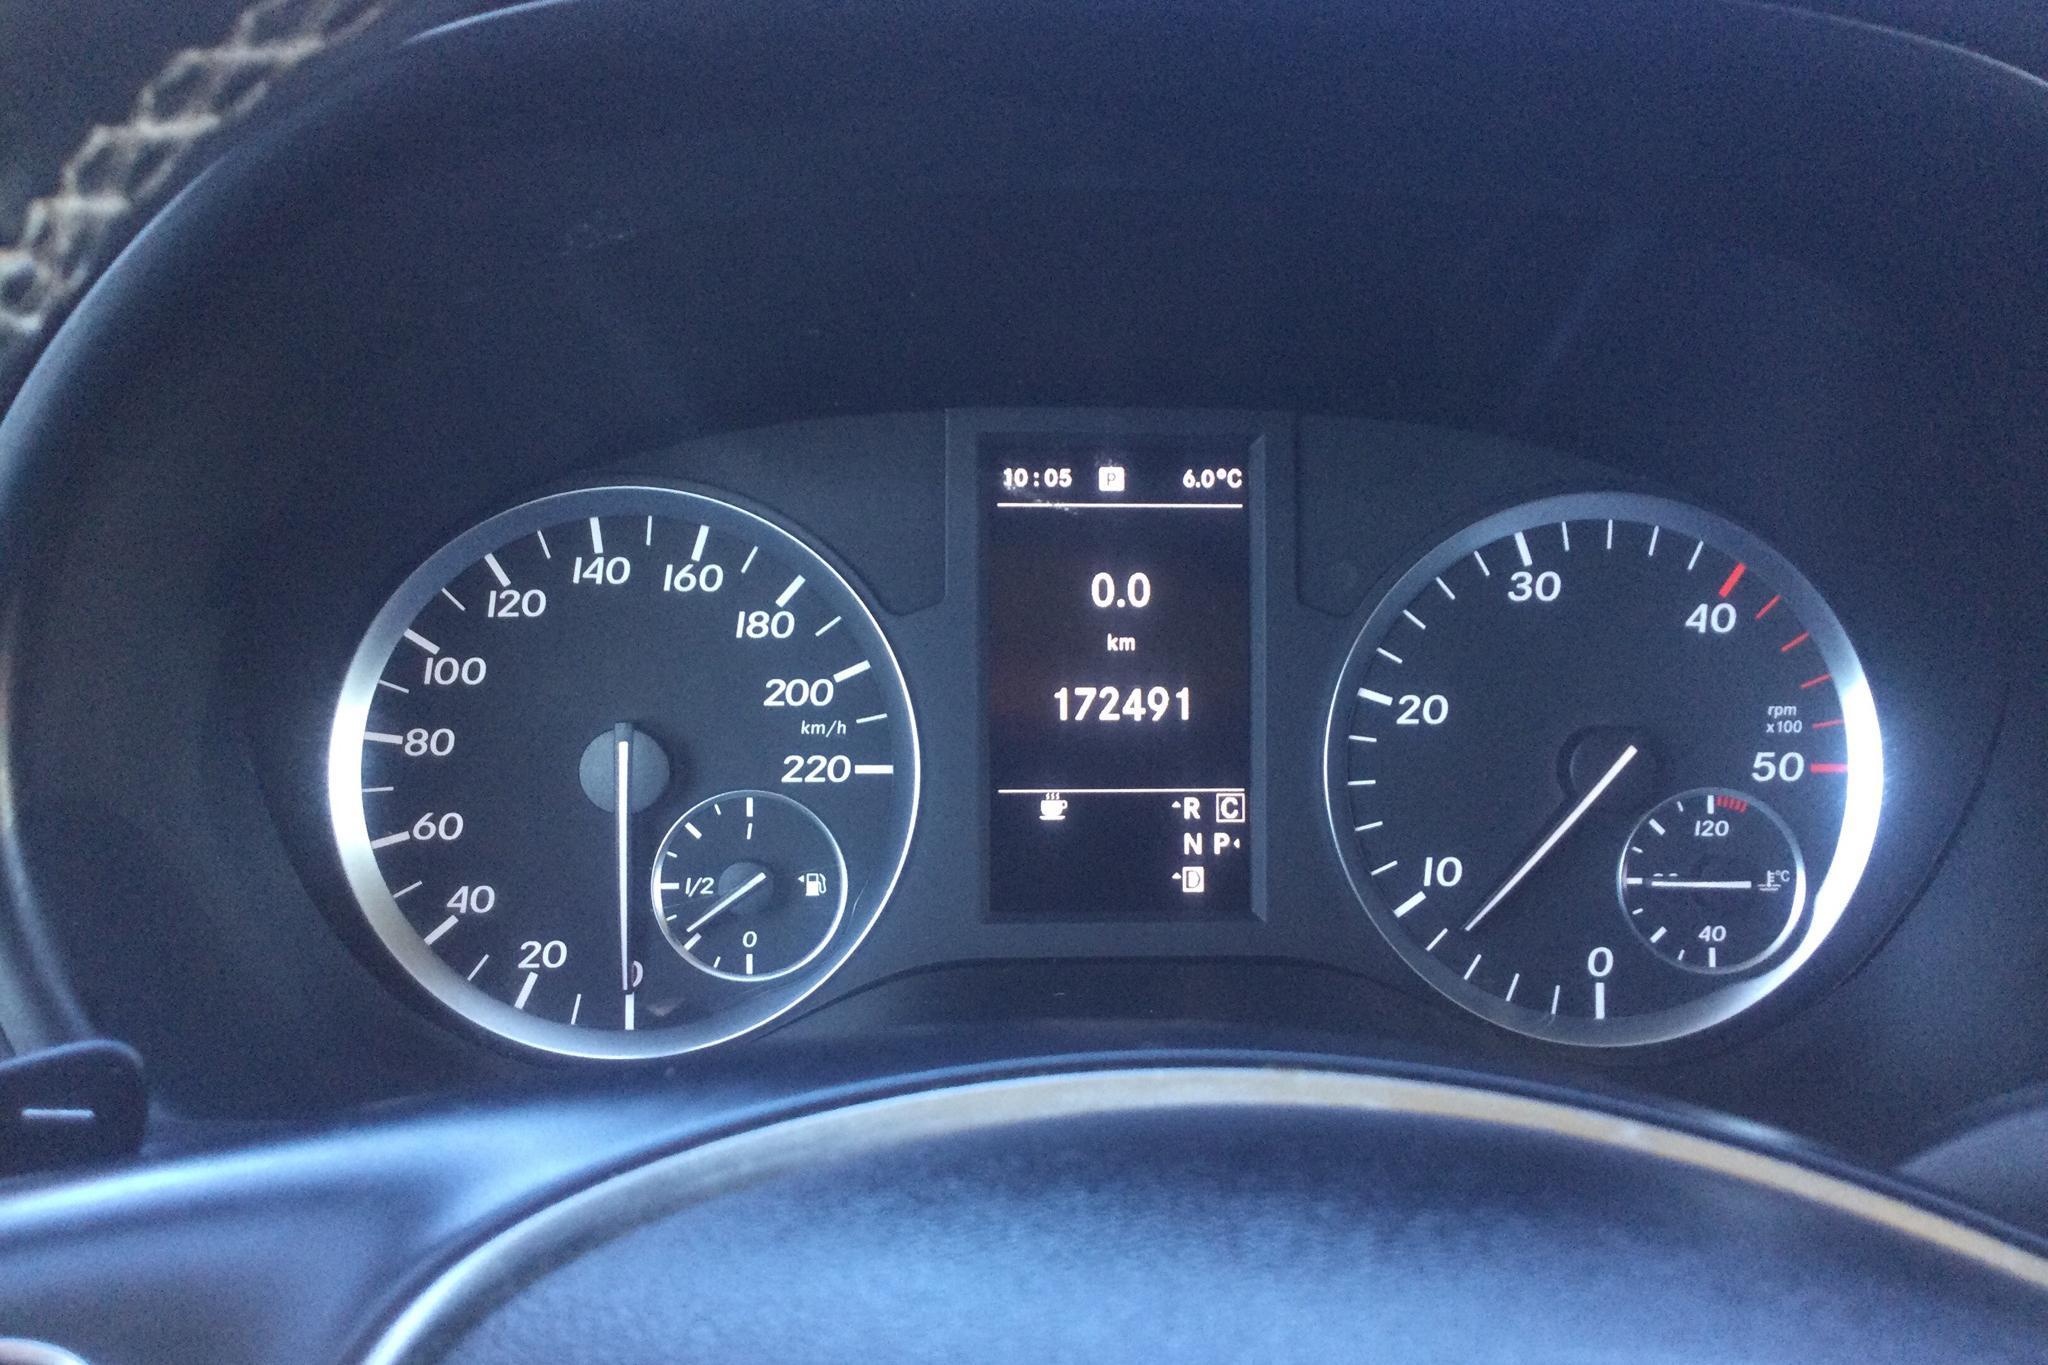 Mercedes Vito 119 BlueTEC 4x4 W640 (190hk) - 17 249 mil - Automat - vit - 2017